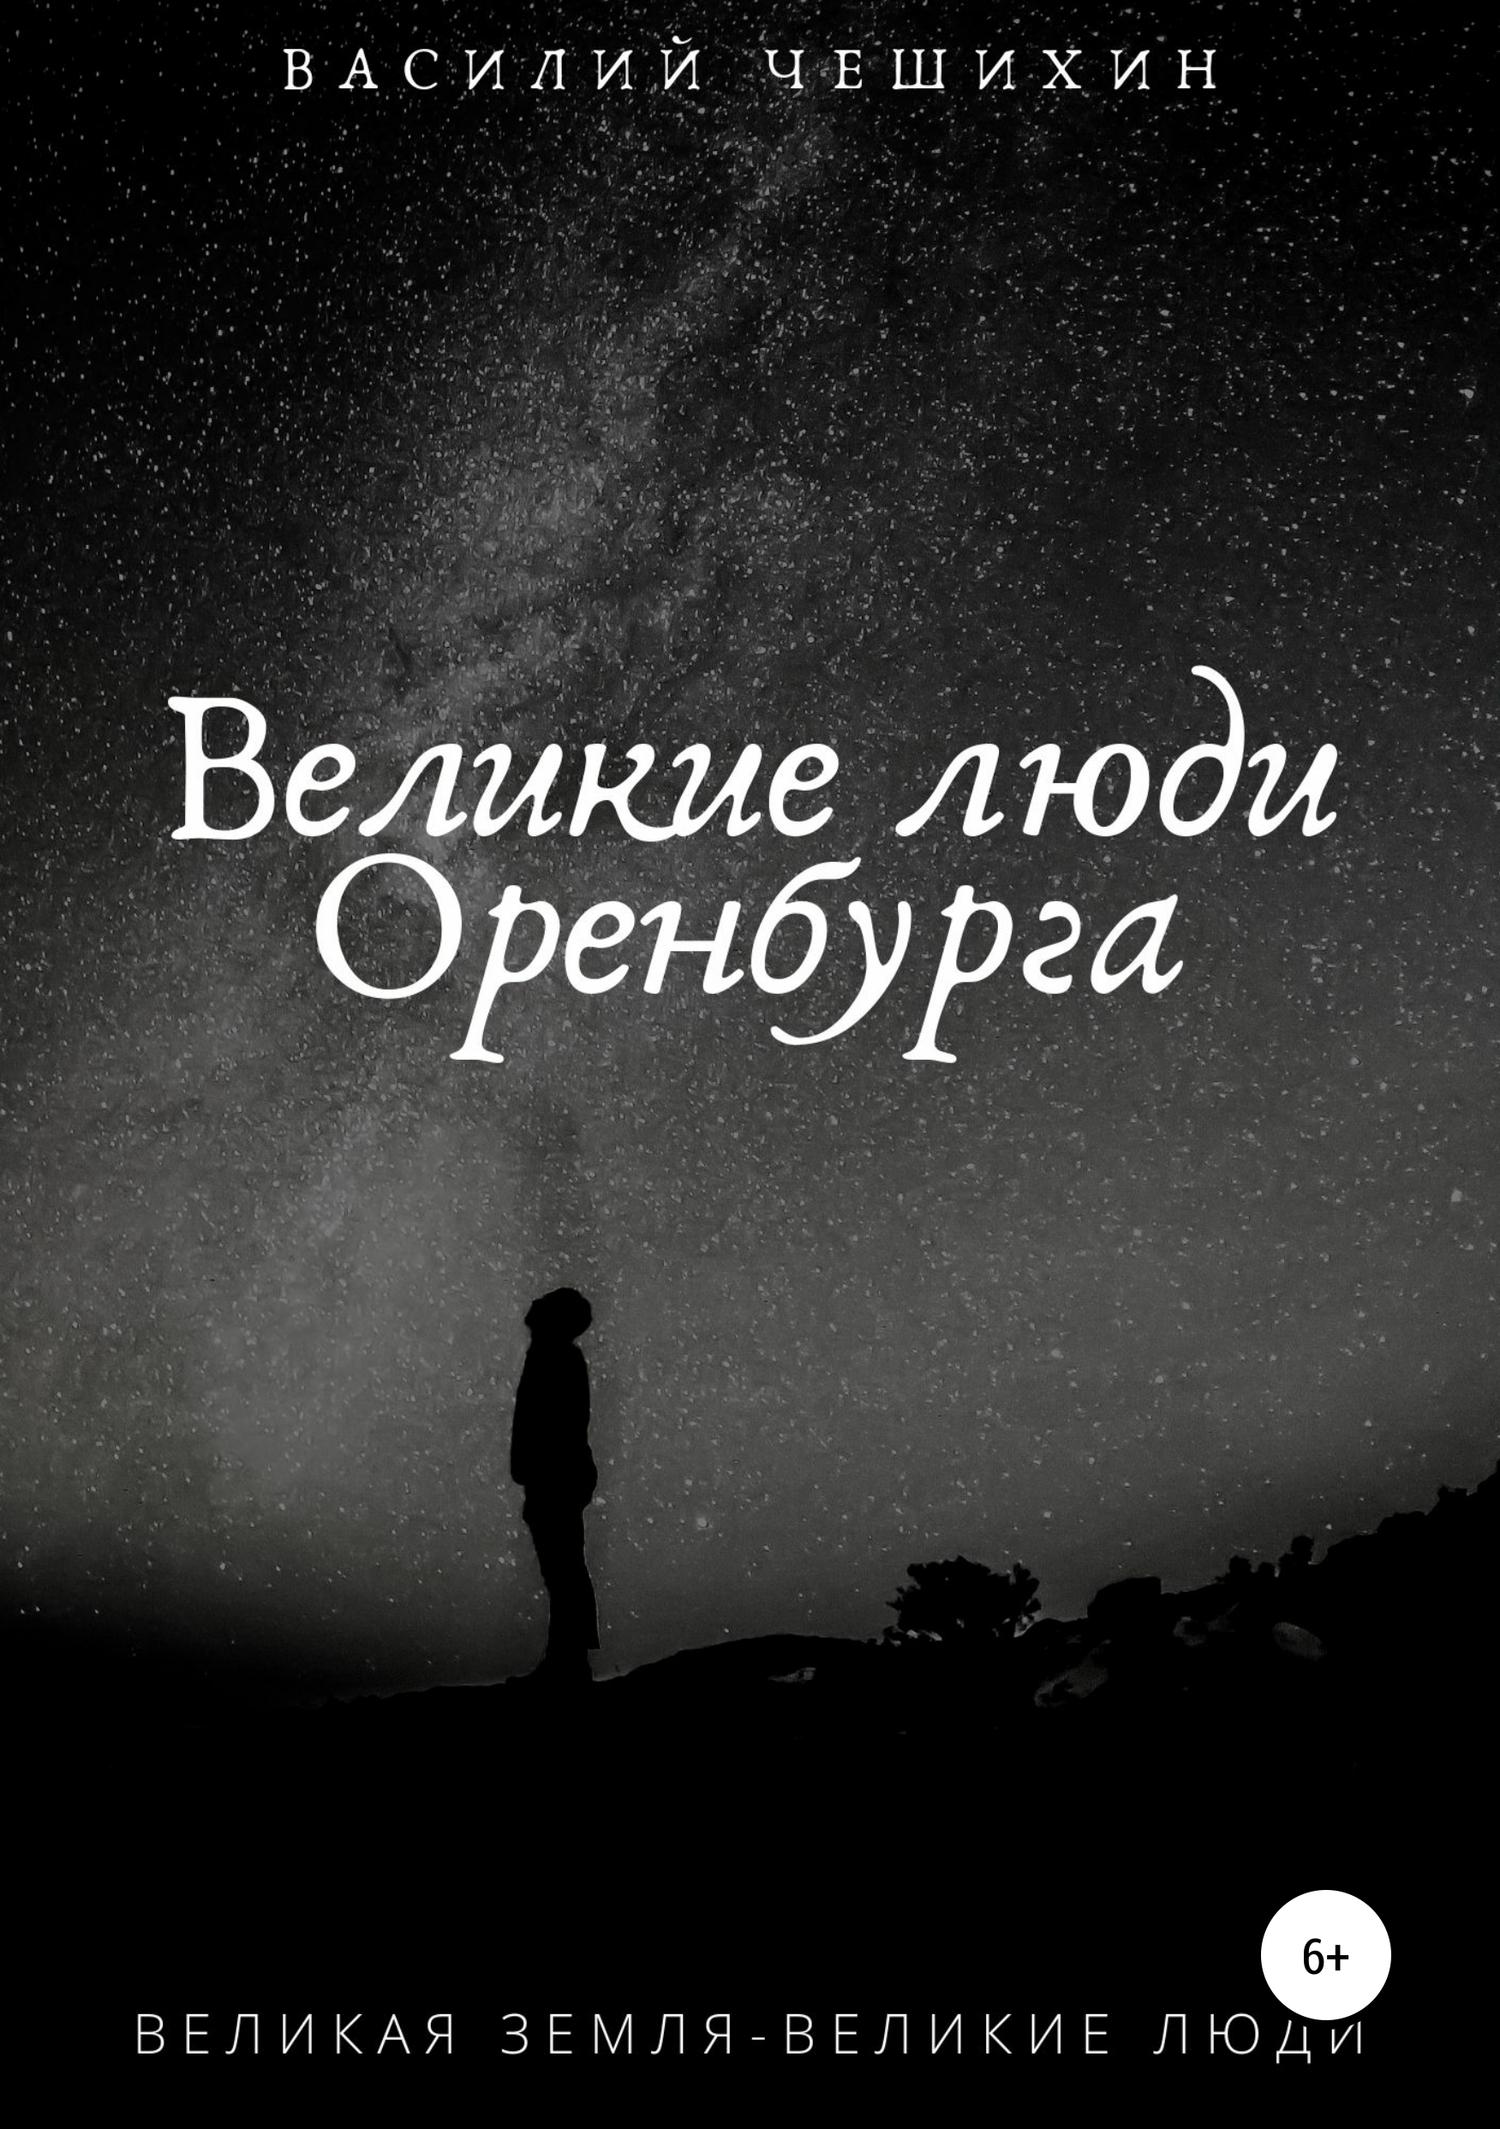 Великие люди Оренбурга